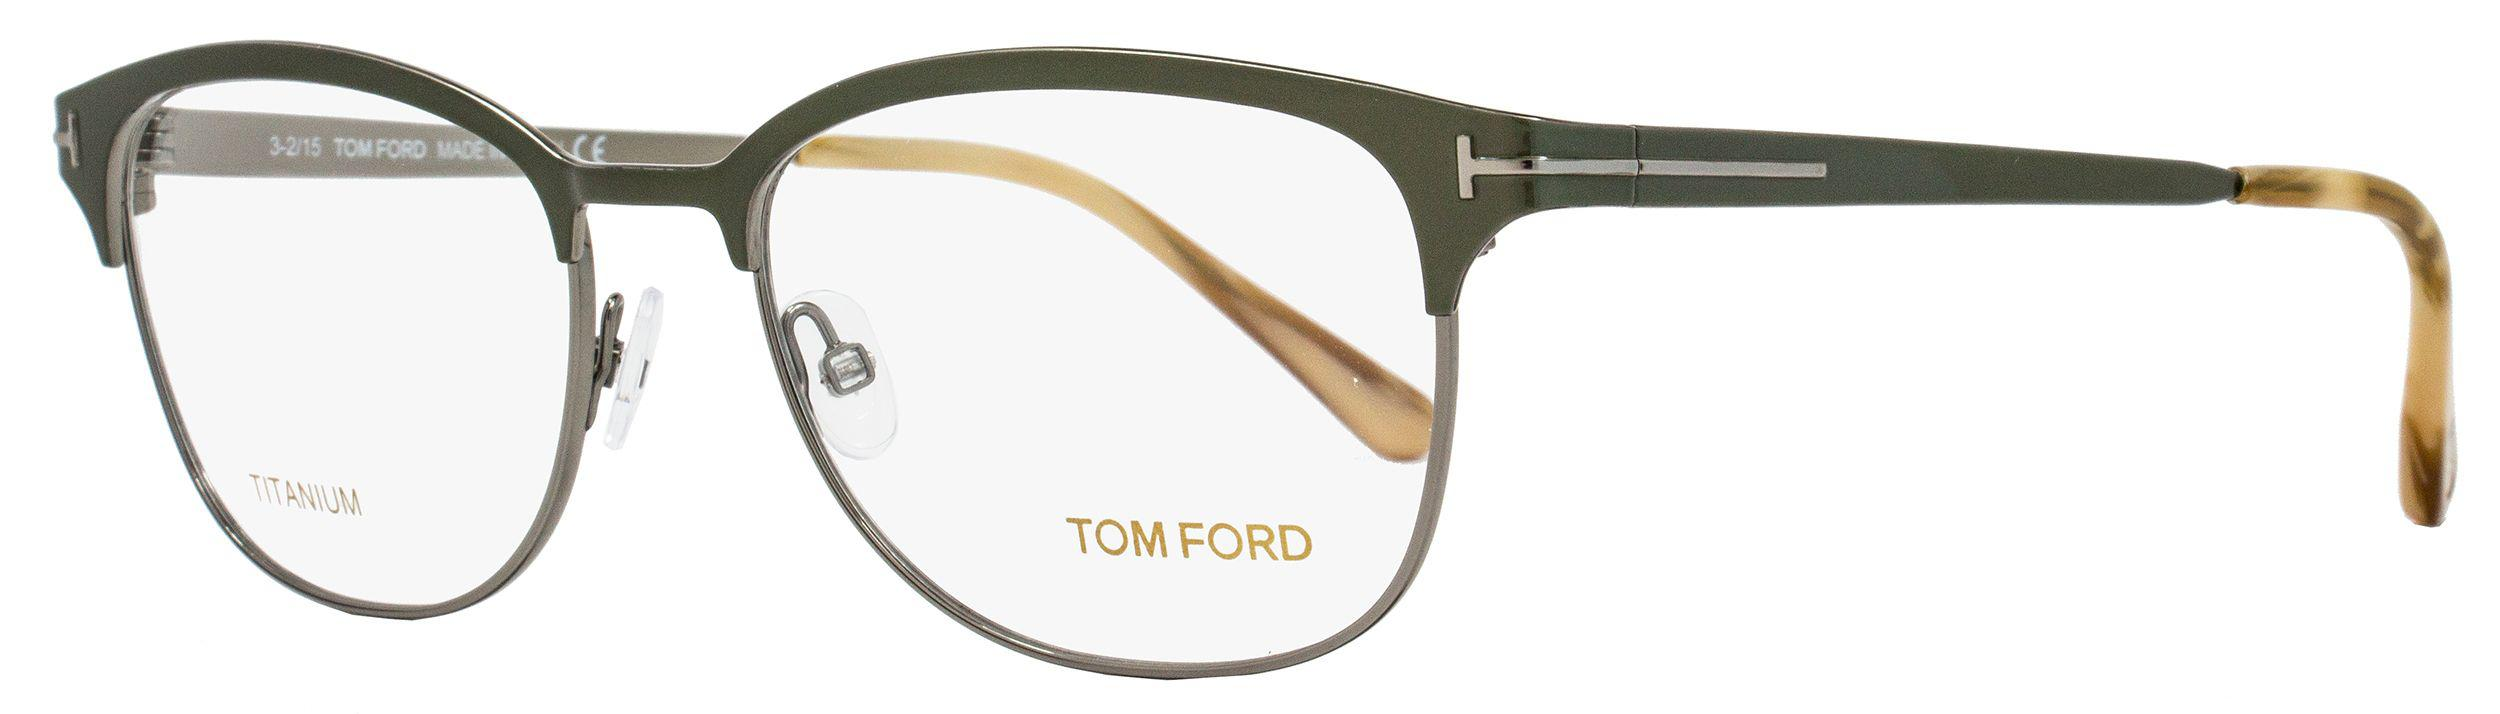 ac8da39a7ab Tom Ford - Multicolor Oval Eyeglasses Tf5381 093 Size  54mm Olive  Green ruthenium Ft5381. View fullscreen